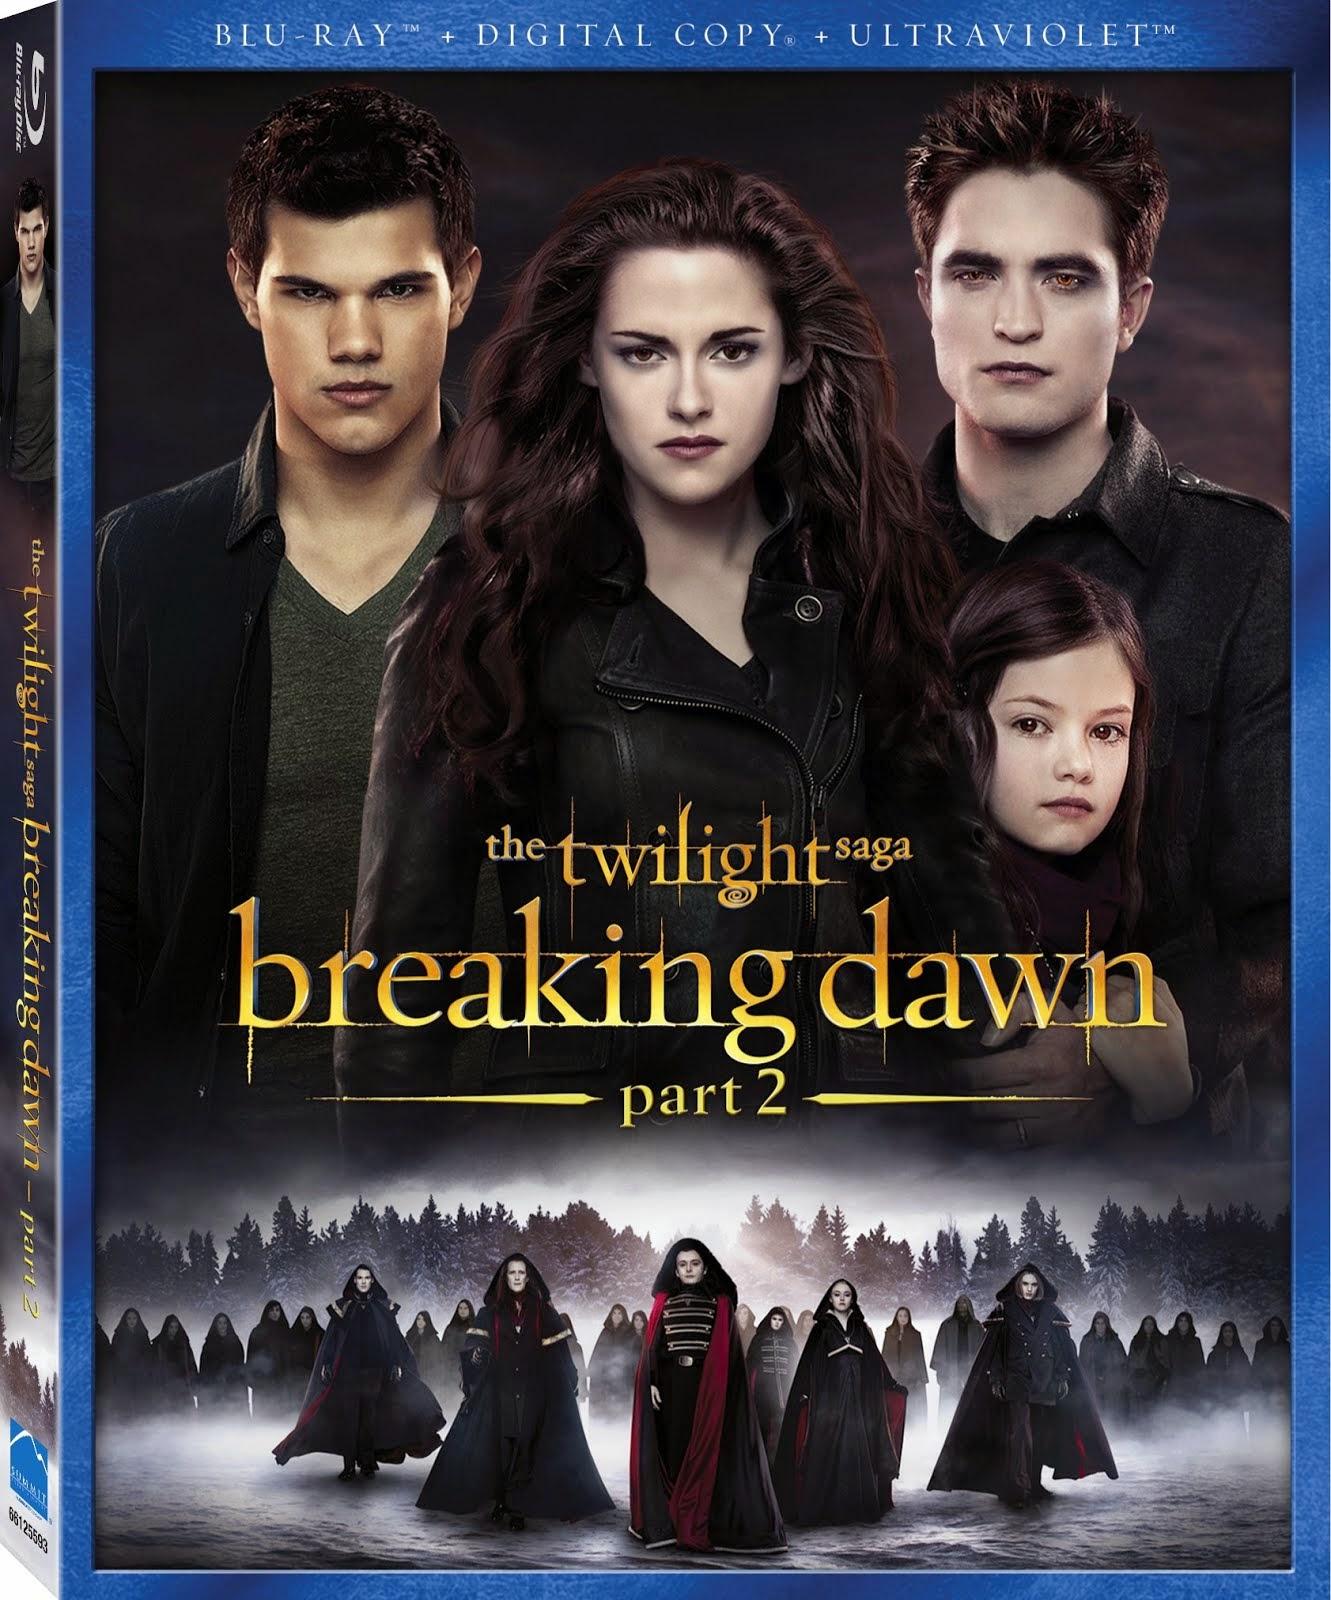 Twilight Saga Breaking Dawn Part 2  (2012) ταινιες online seires xrysoi greek subs